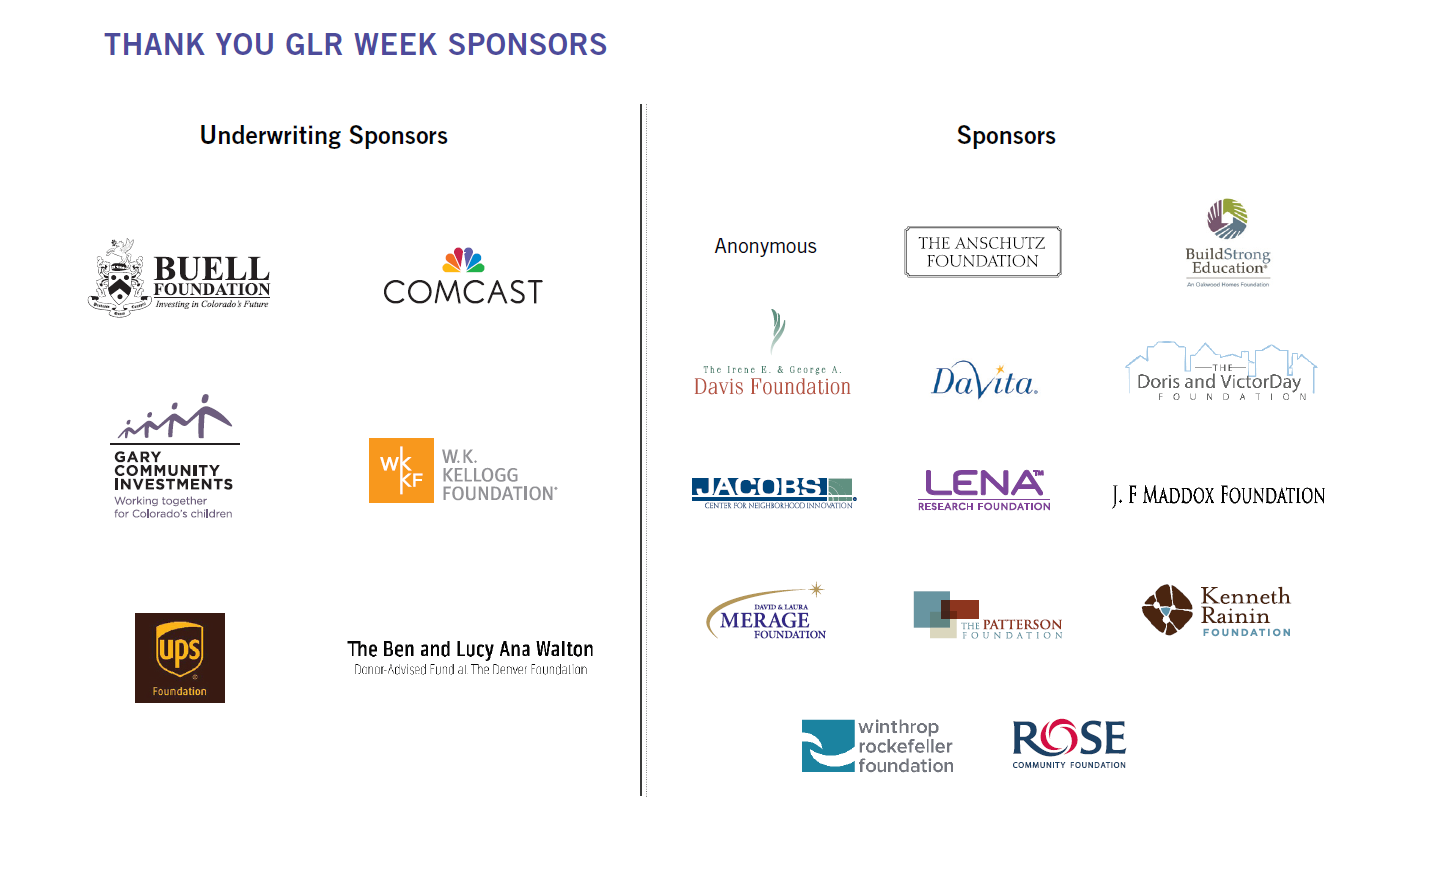 GLR Week Sponsor Image